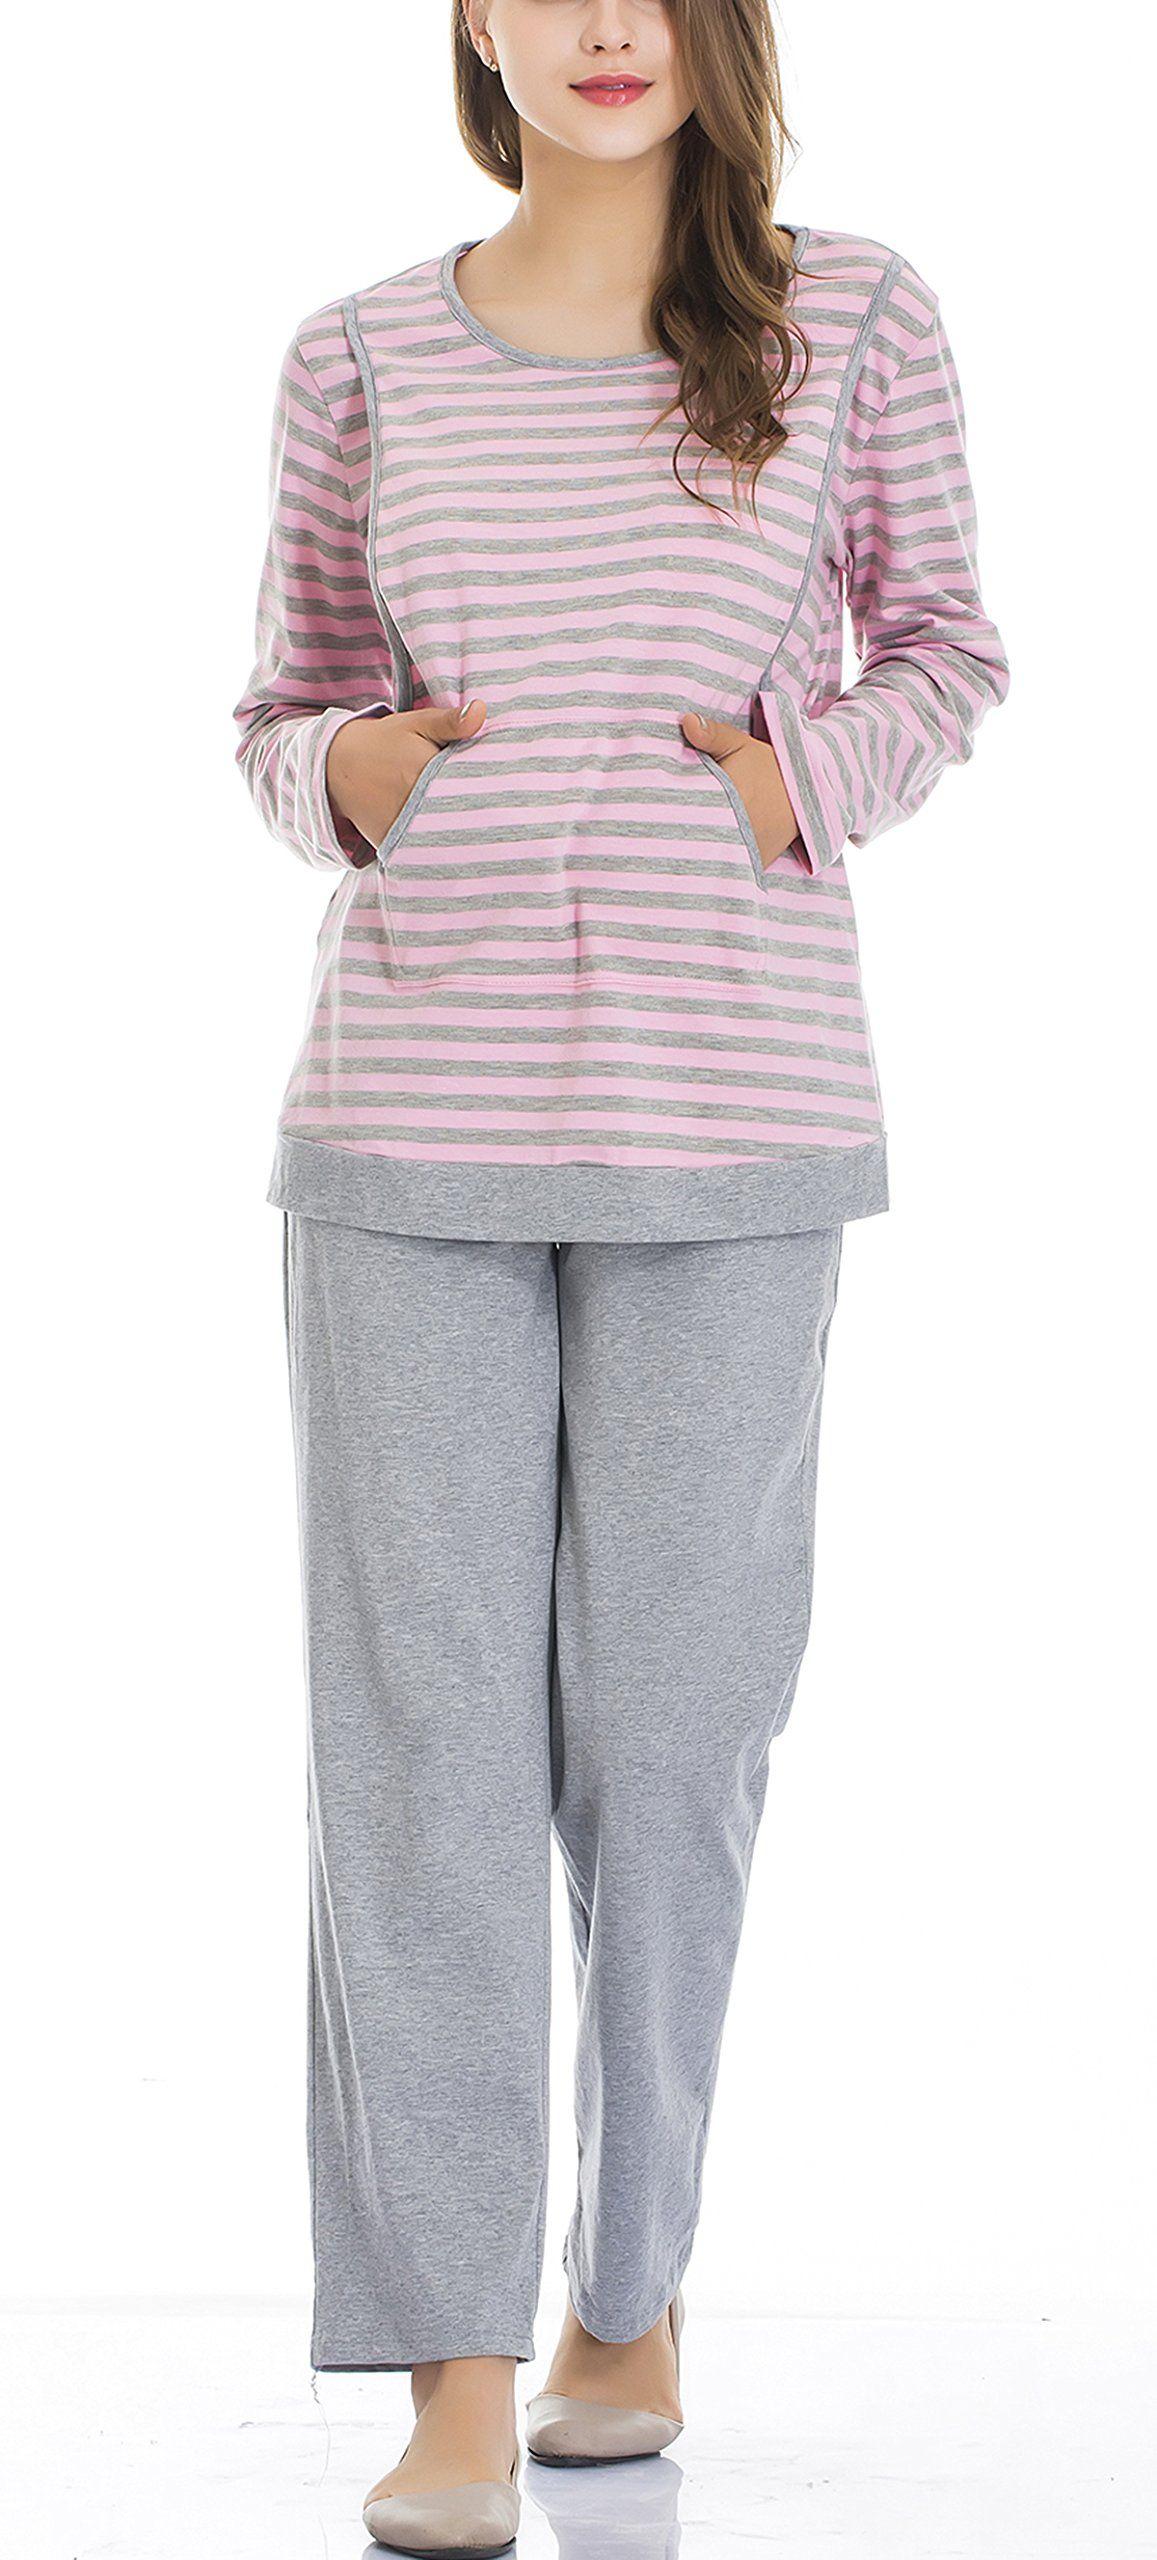 672d605db763b nursing tops - Epmami Womens Nursing Pajamas Maternity Breastfeeding  Pajamas/pjs Sets Pink Size Medium * You can get additional details at the  photo link.